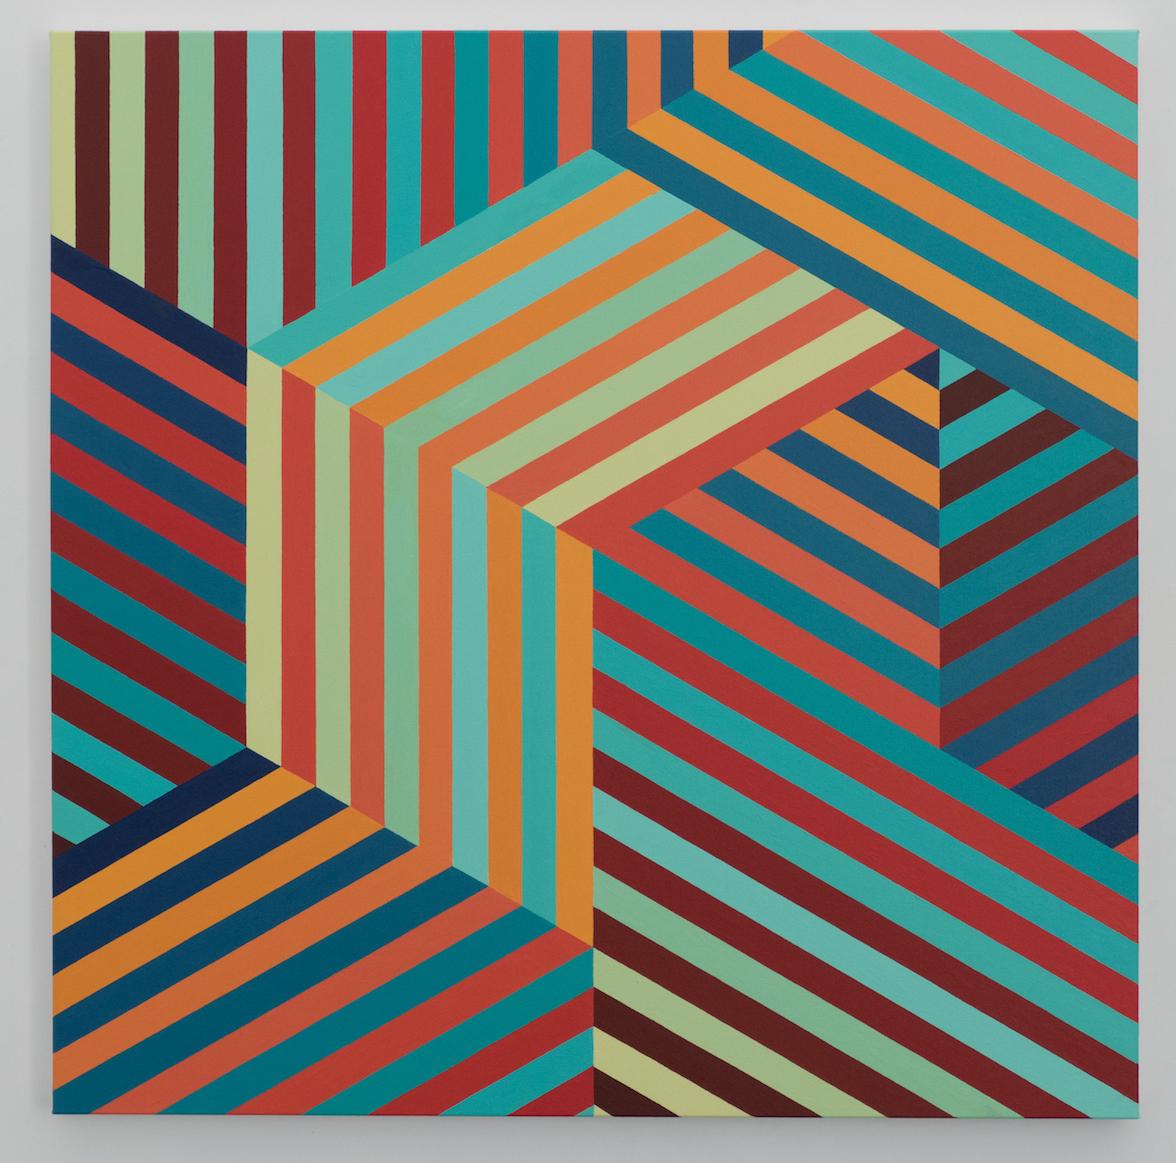 Tom Loveday Edge of Reality 4, 2018, Acrylic On Canvas 107 x 107 cm